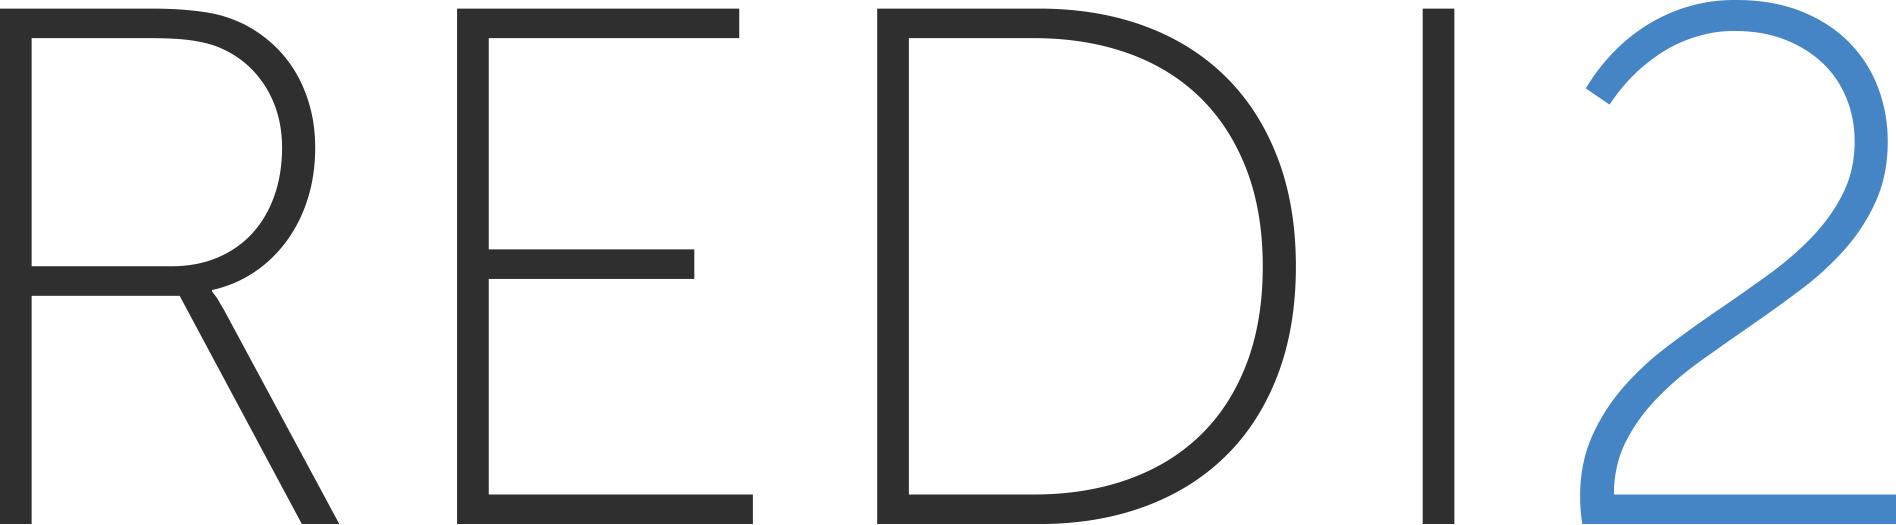 Redi2 Technologies, Inc. logo